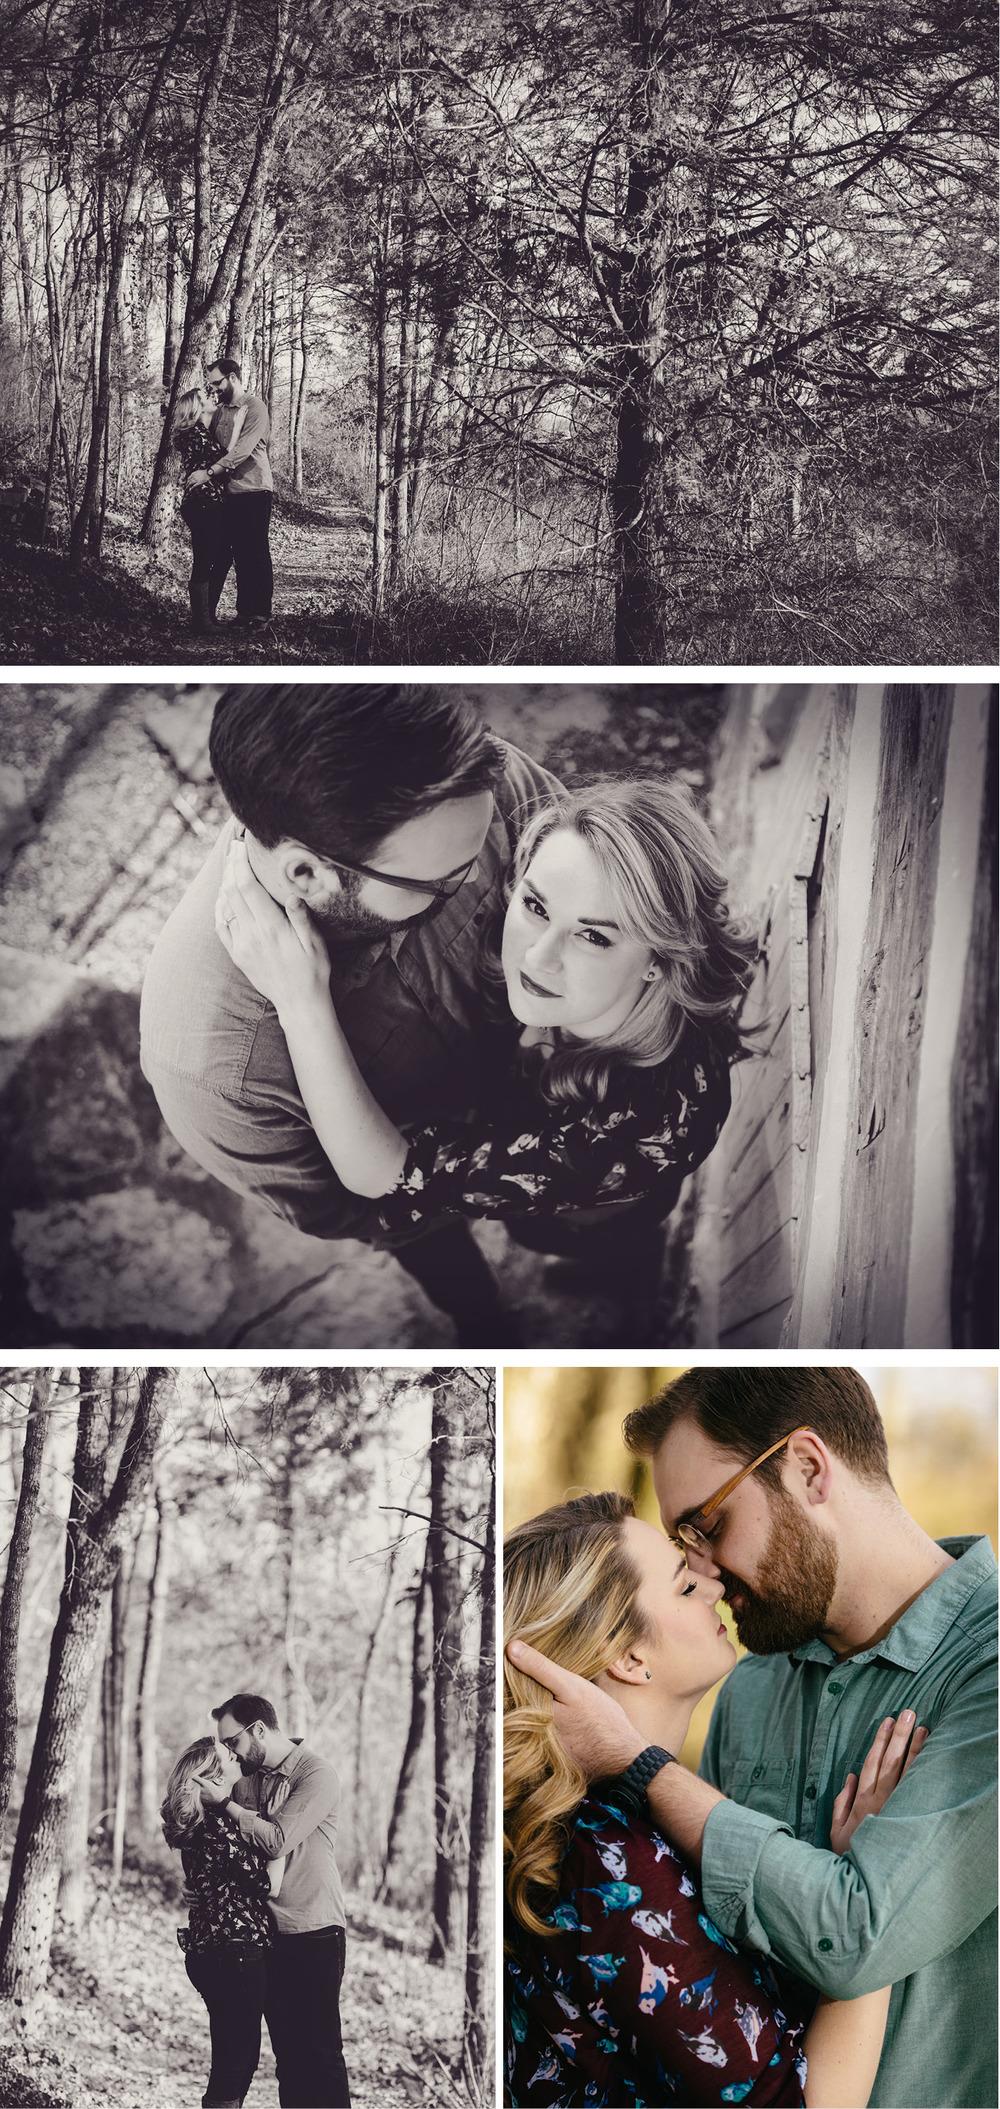 CK-Photo-Nashville-Engagement-Photographer-st-4.jpg